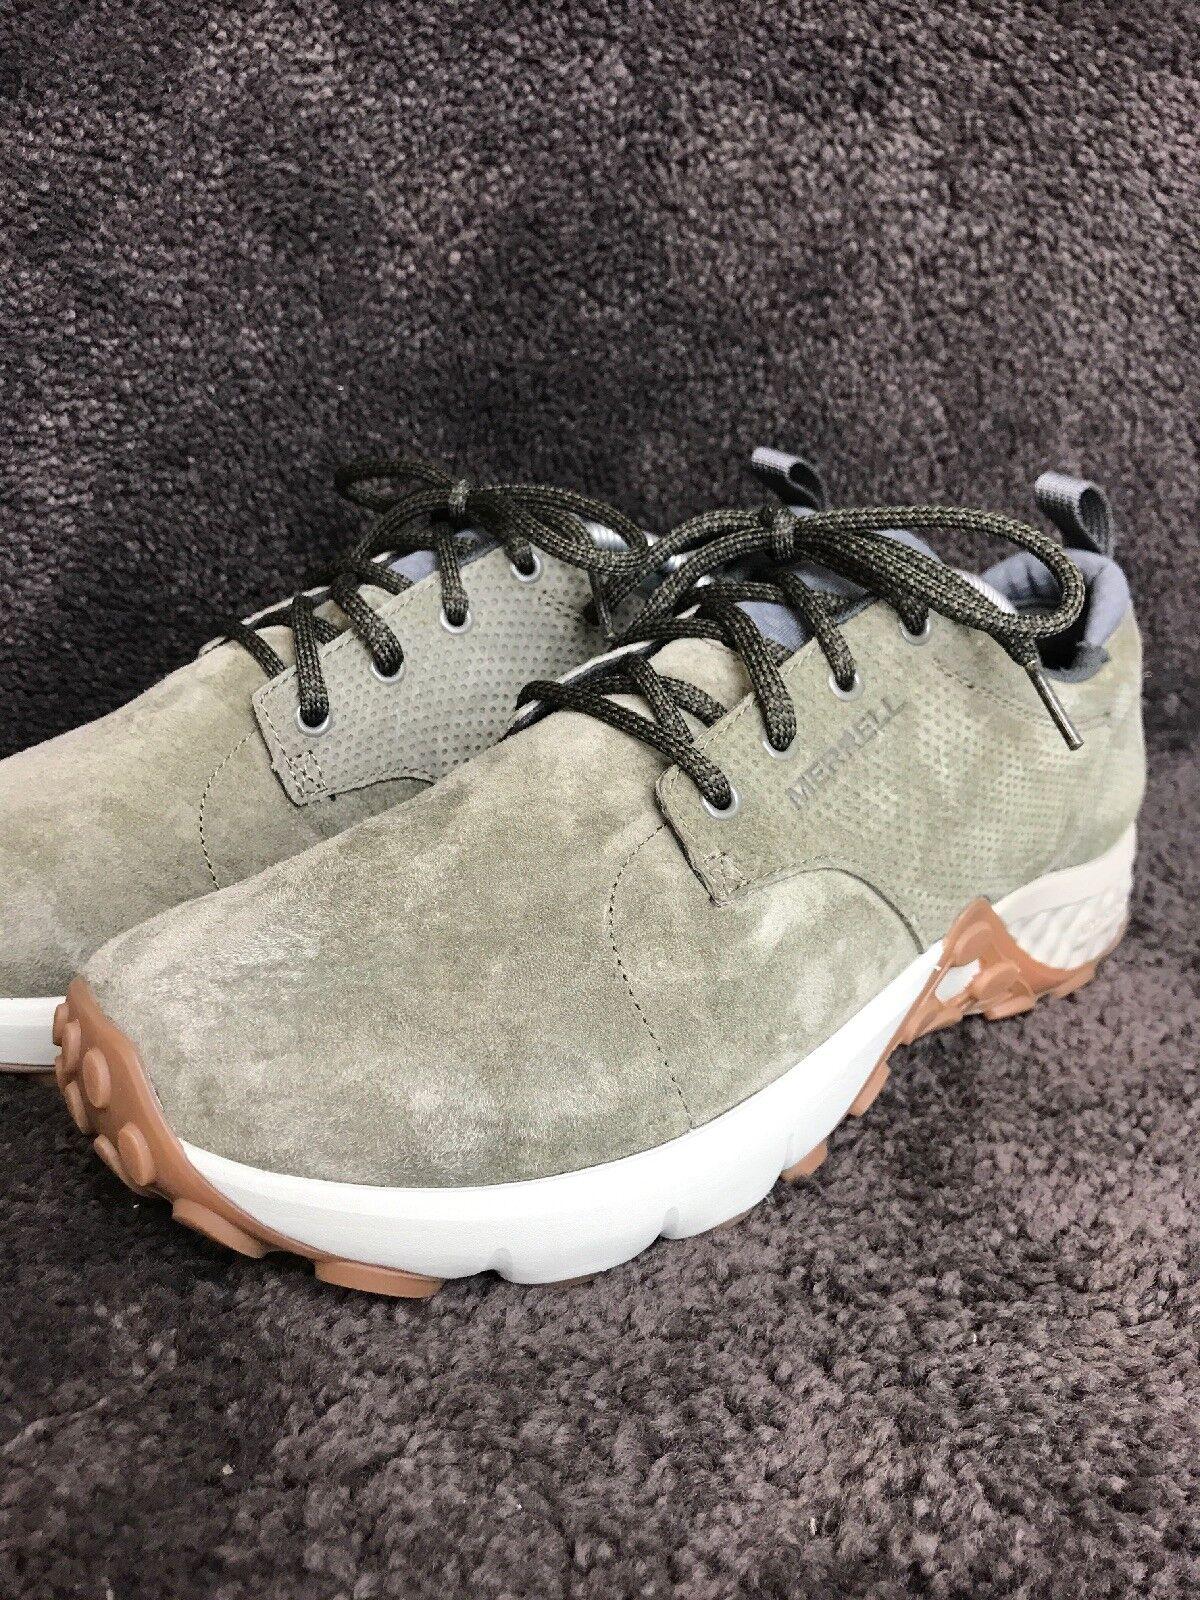 Merrell Men's Dusty Olive Jungle Lace AC+ Hiking shoes Sz 9.5 (J91709) 243